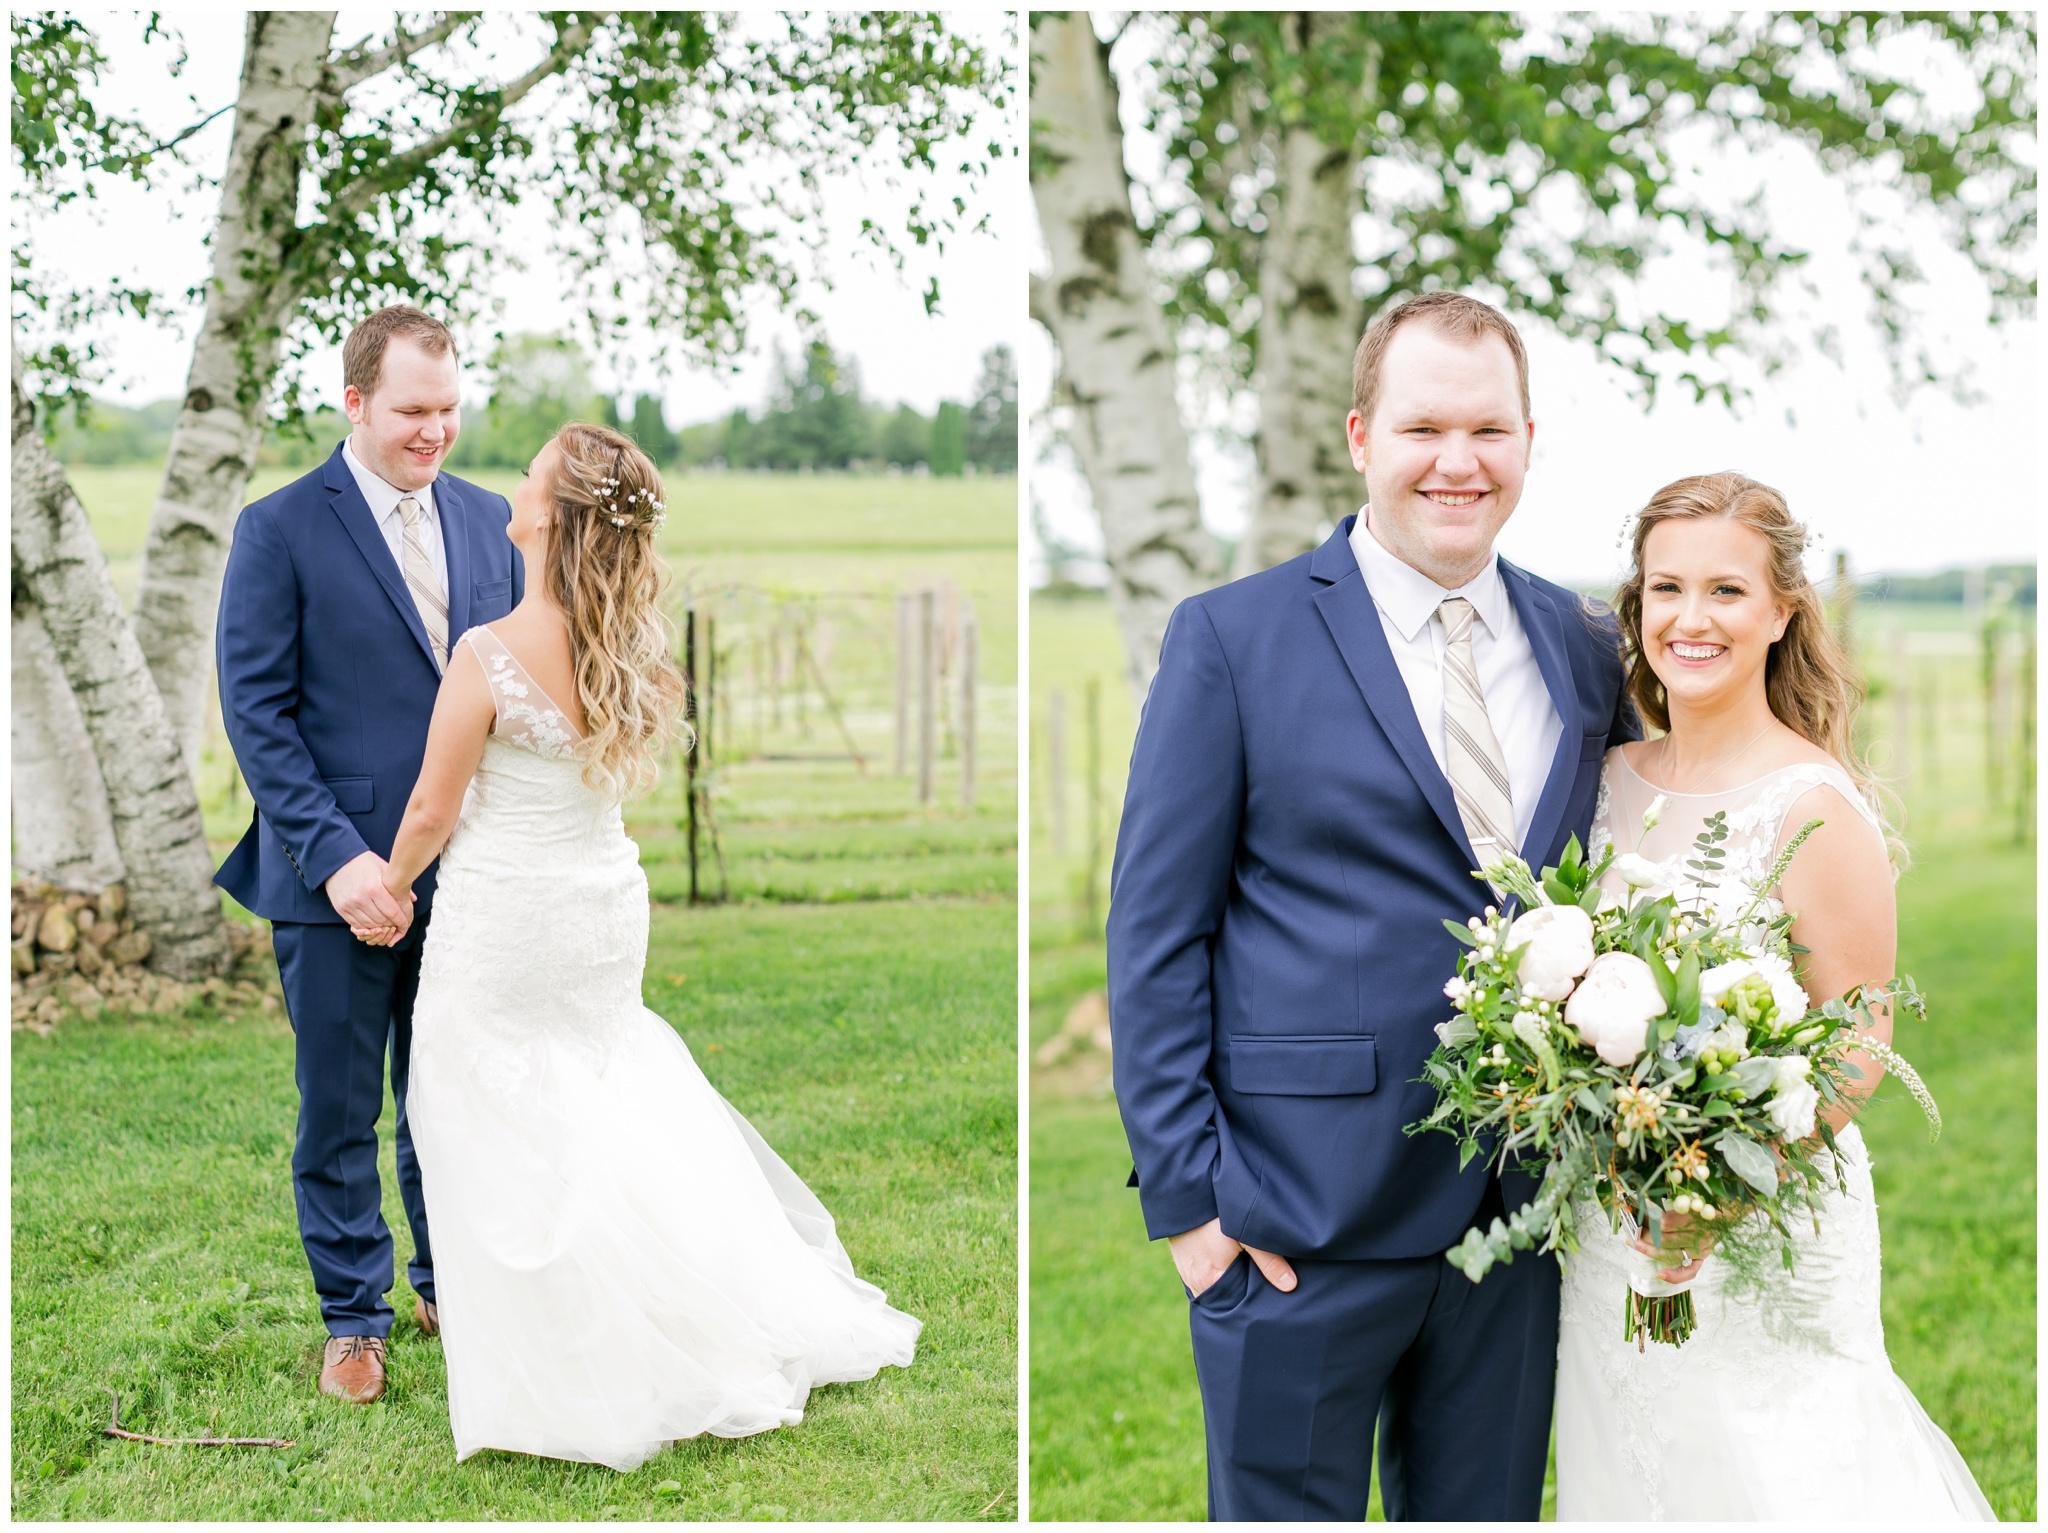 over_the_vines_wedding_edgerton_wisconsin_wedding_caynay_photo_3981.jpg